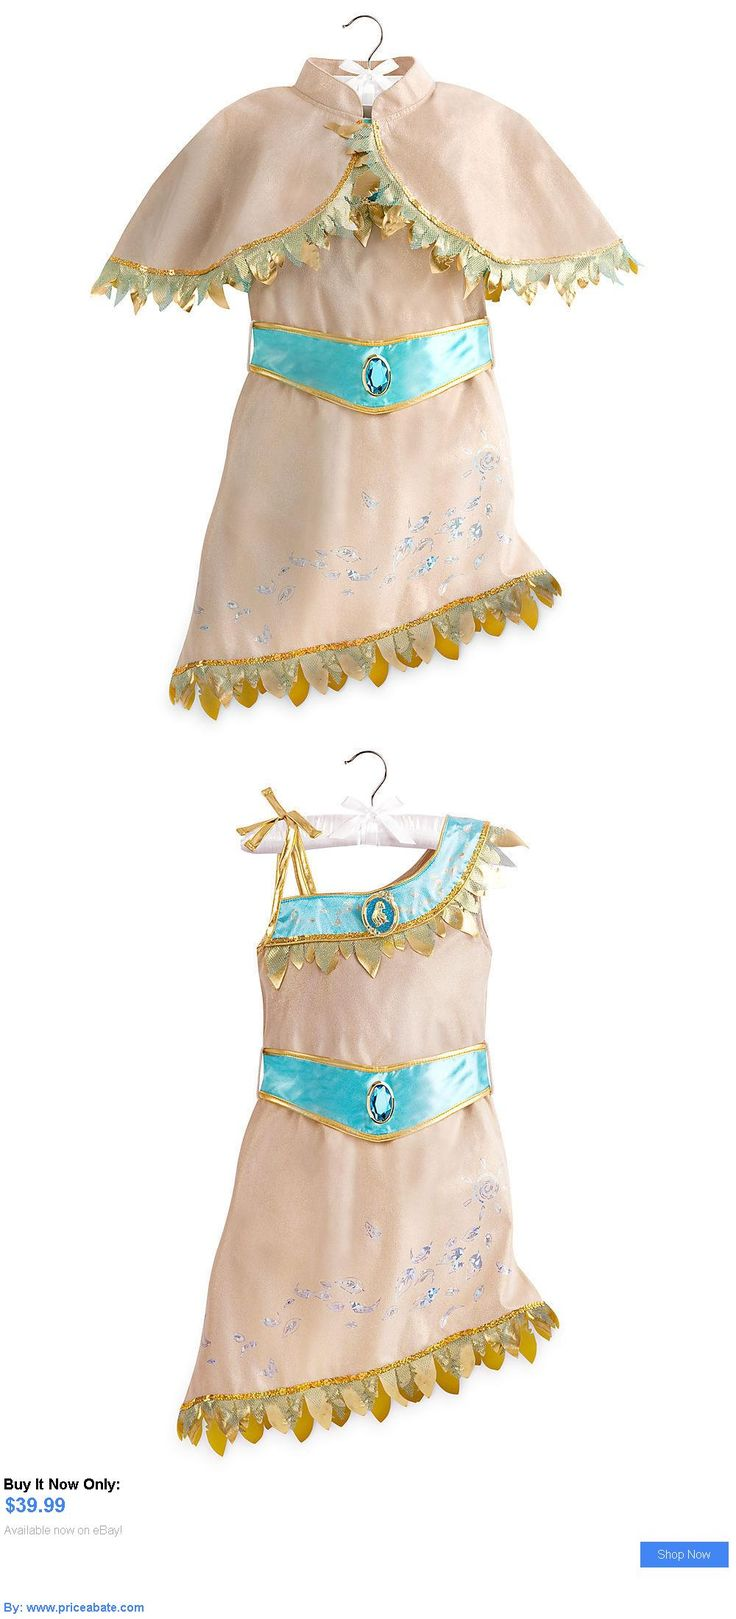 Kids Costumes: Disney Store Princess Pocahontas Halloween Costume Dress Girl Size 5/6 7/8 BUY IT NOW ONLY: $39.99 #priceabateKidsCostumes OR #priceabate